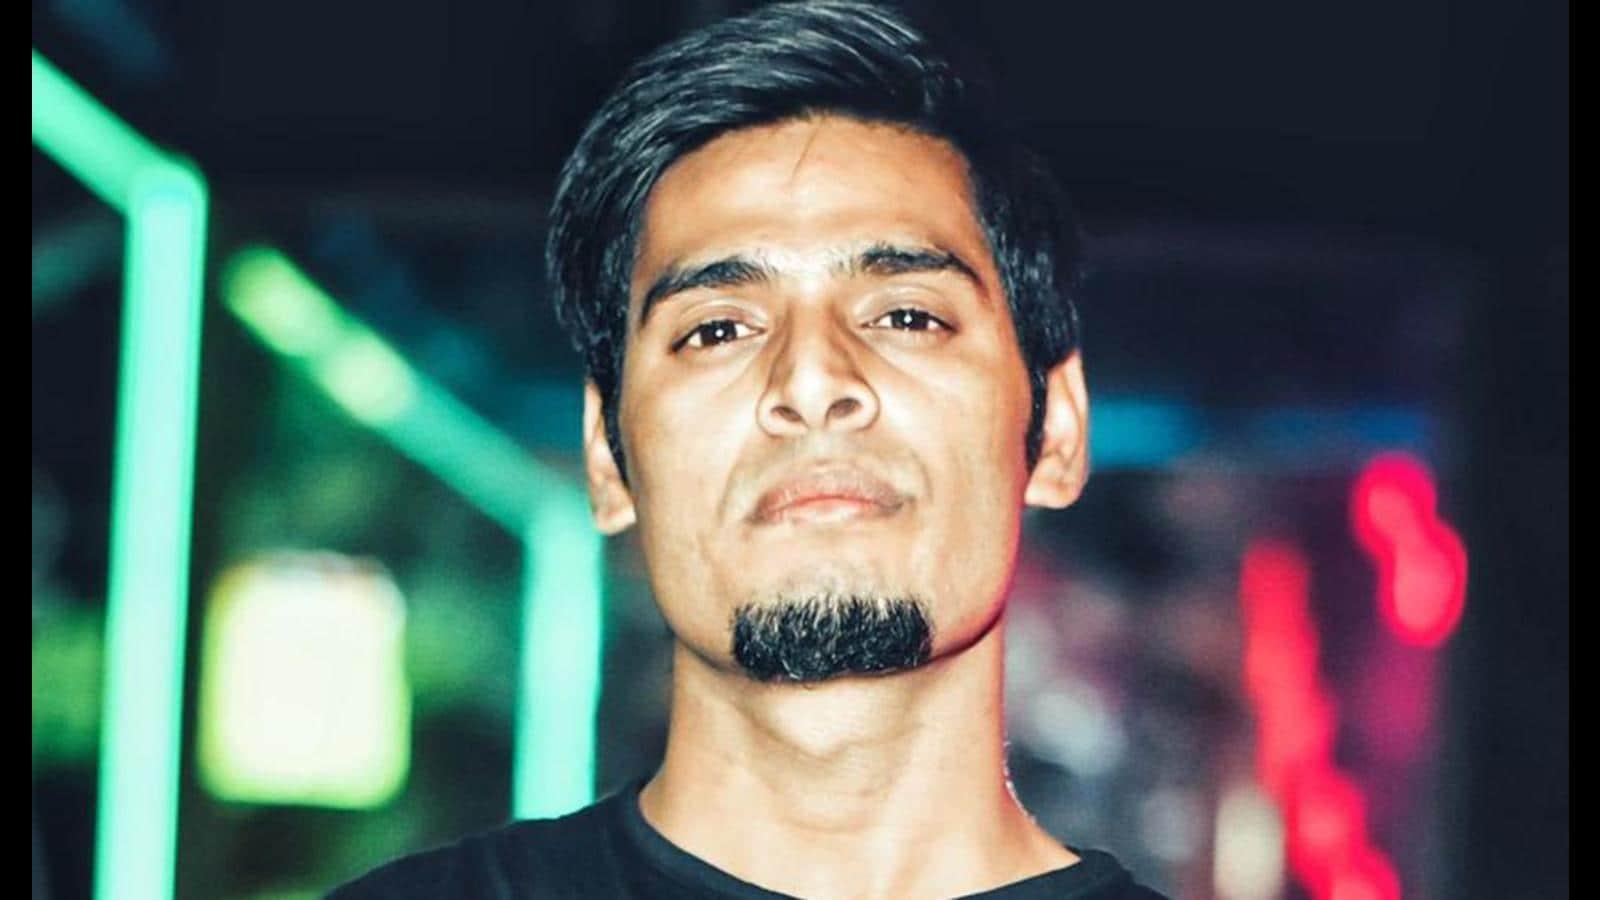 Indie music is giving me greater satisfaction: Irshad Ryan